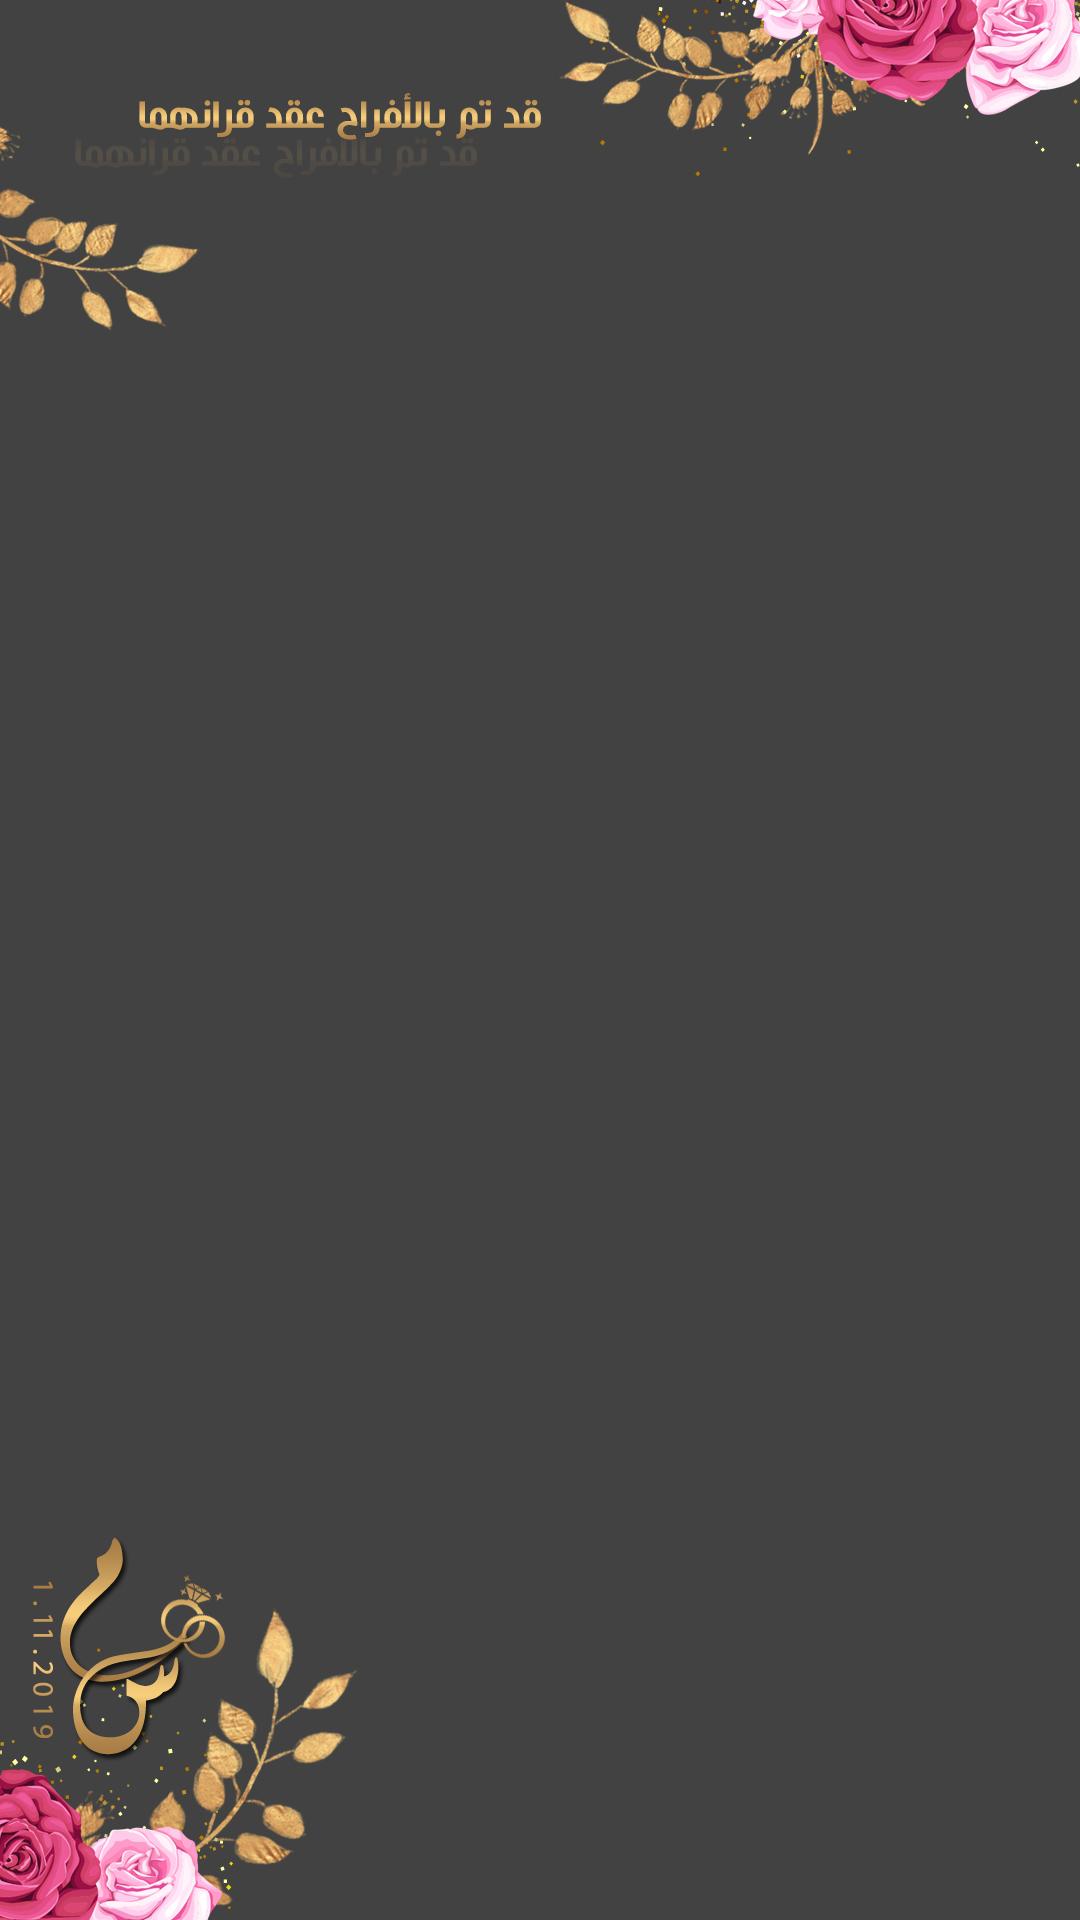 Freetoedit تقويم تاريخ ذهبي 2019 فلتر زواج ورد انوار عريس قفص خاتم إطار قلوب Floral Wallpaper Phone Phone Wallpaper Design Floral Cards Design